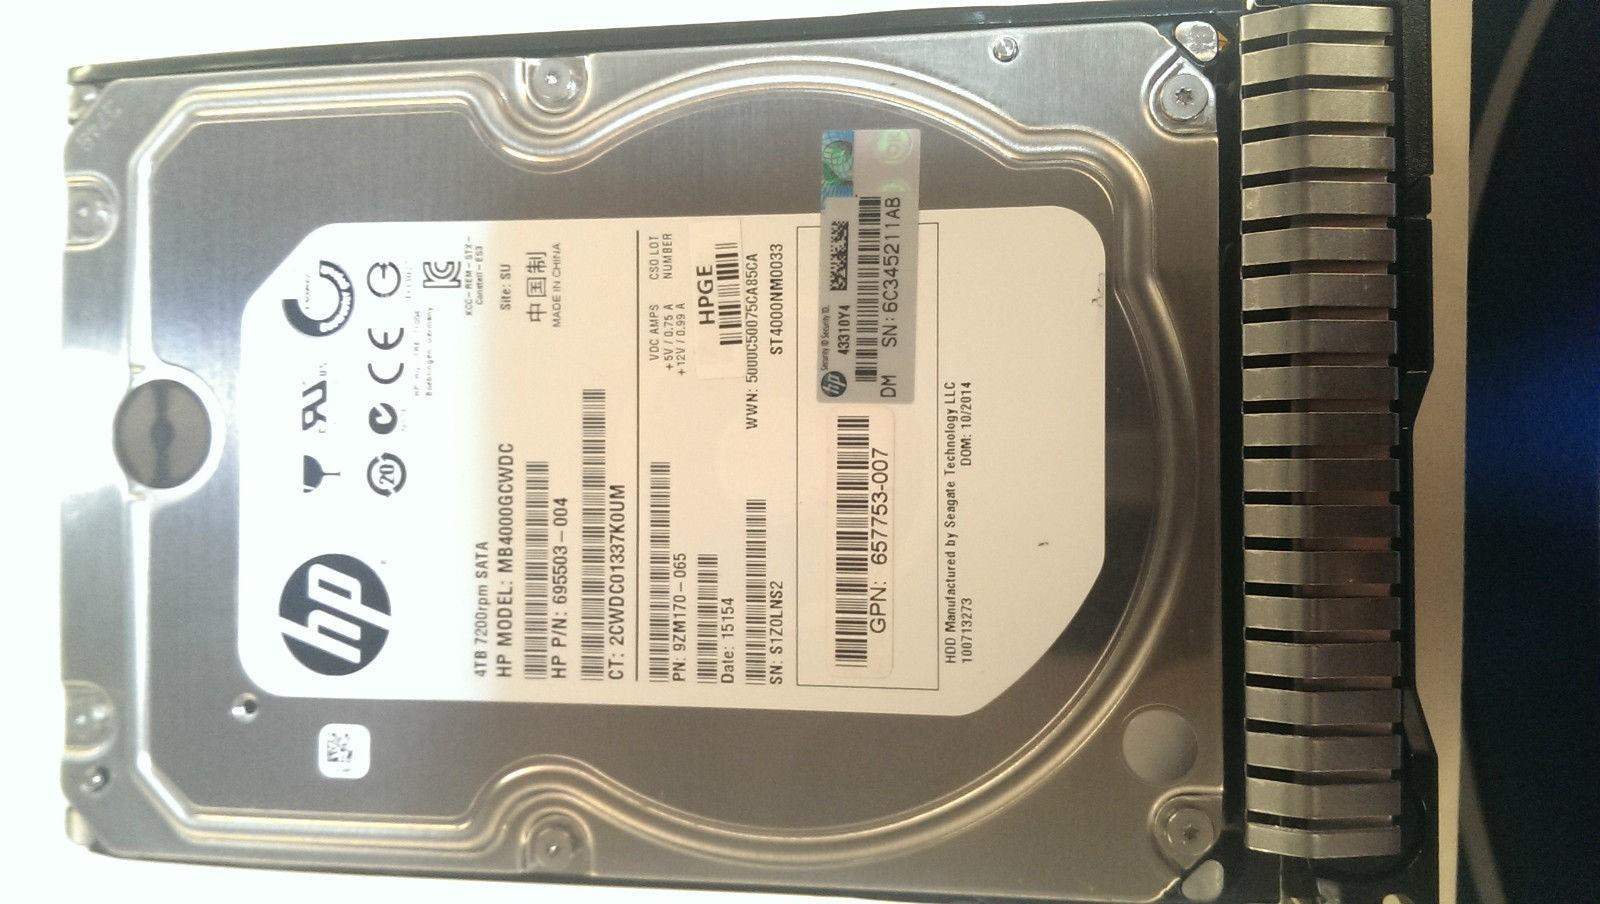 MB4000GCWDC HP 4TB 7.2K 6G LFF SATA HARD DRIVE Image